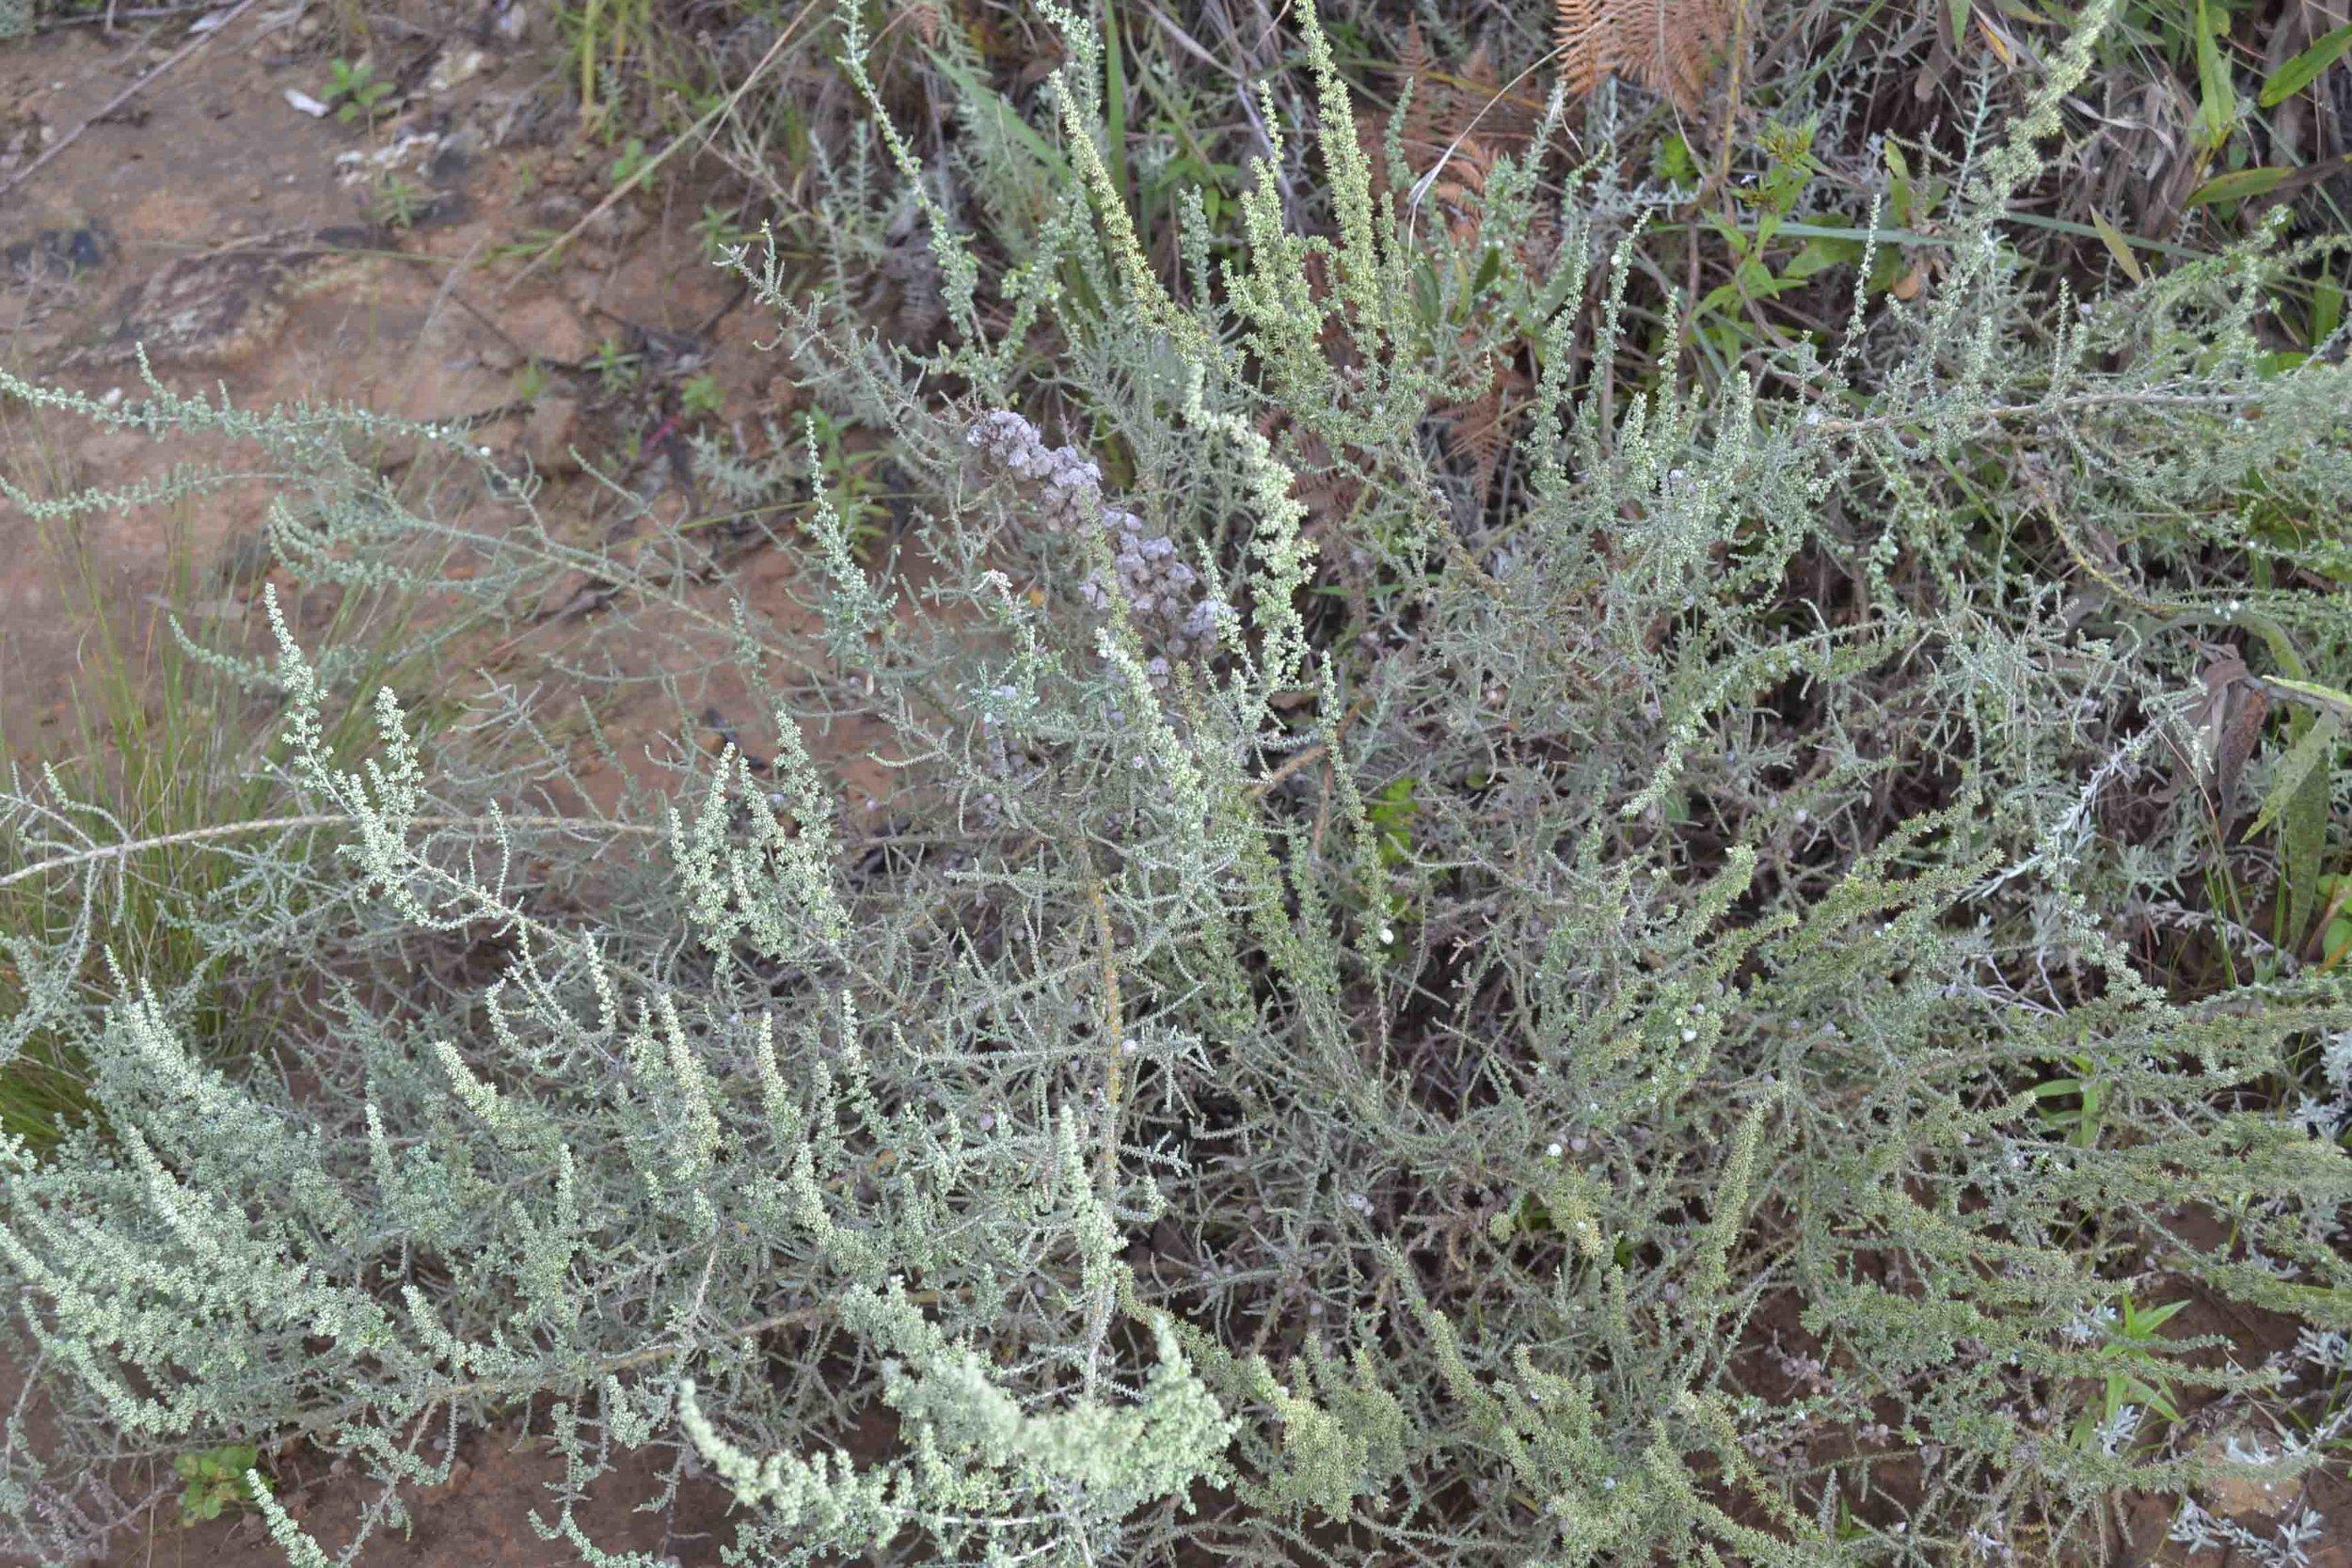 Seriphium plumosum  (Bankrotbos) also known as  Stoebe plumosa